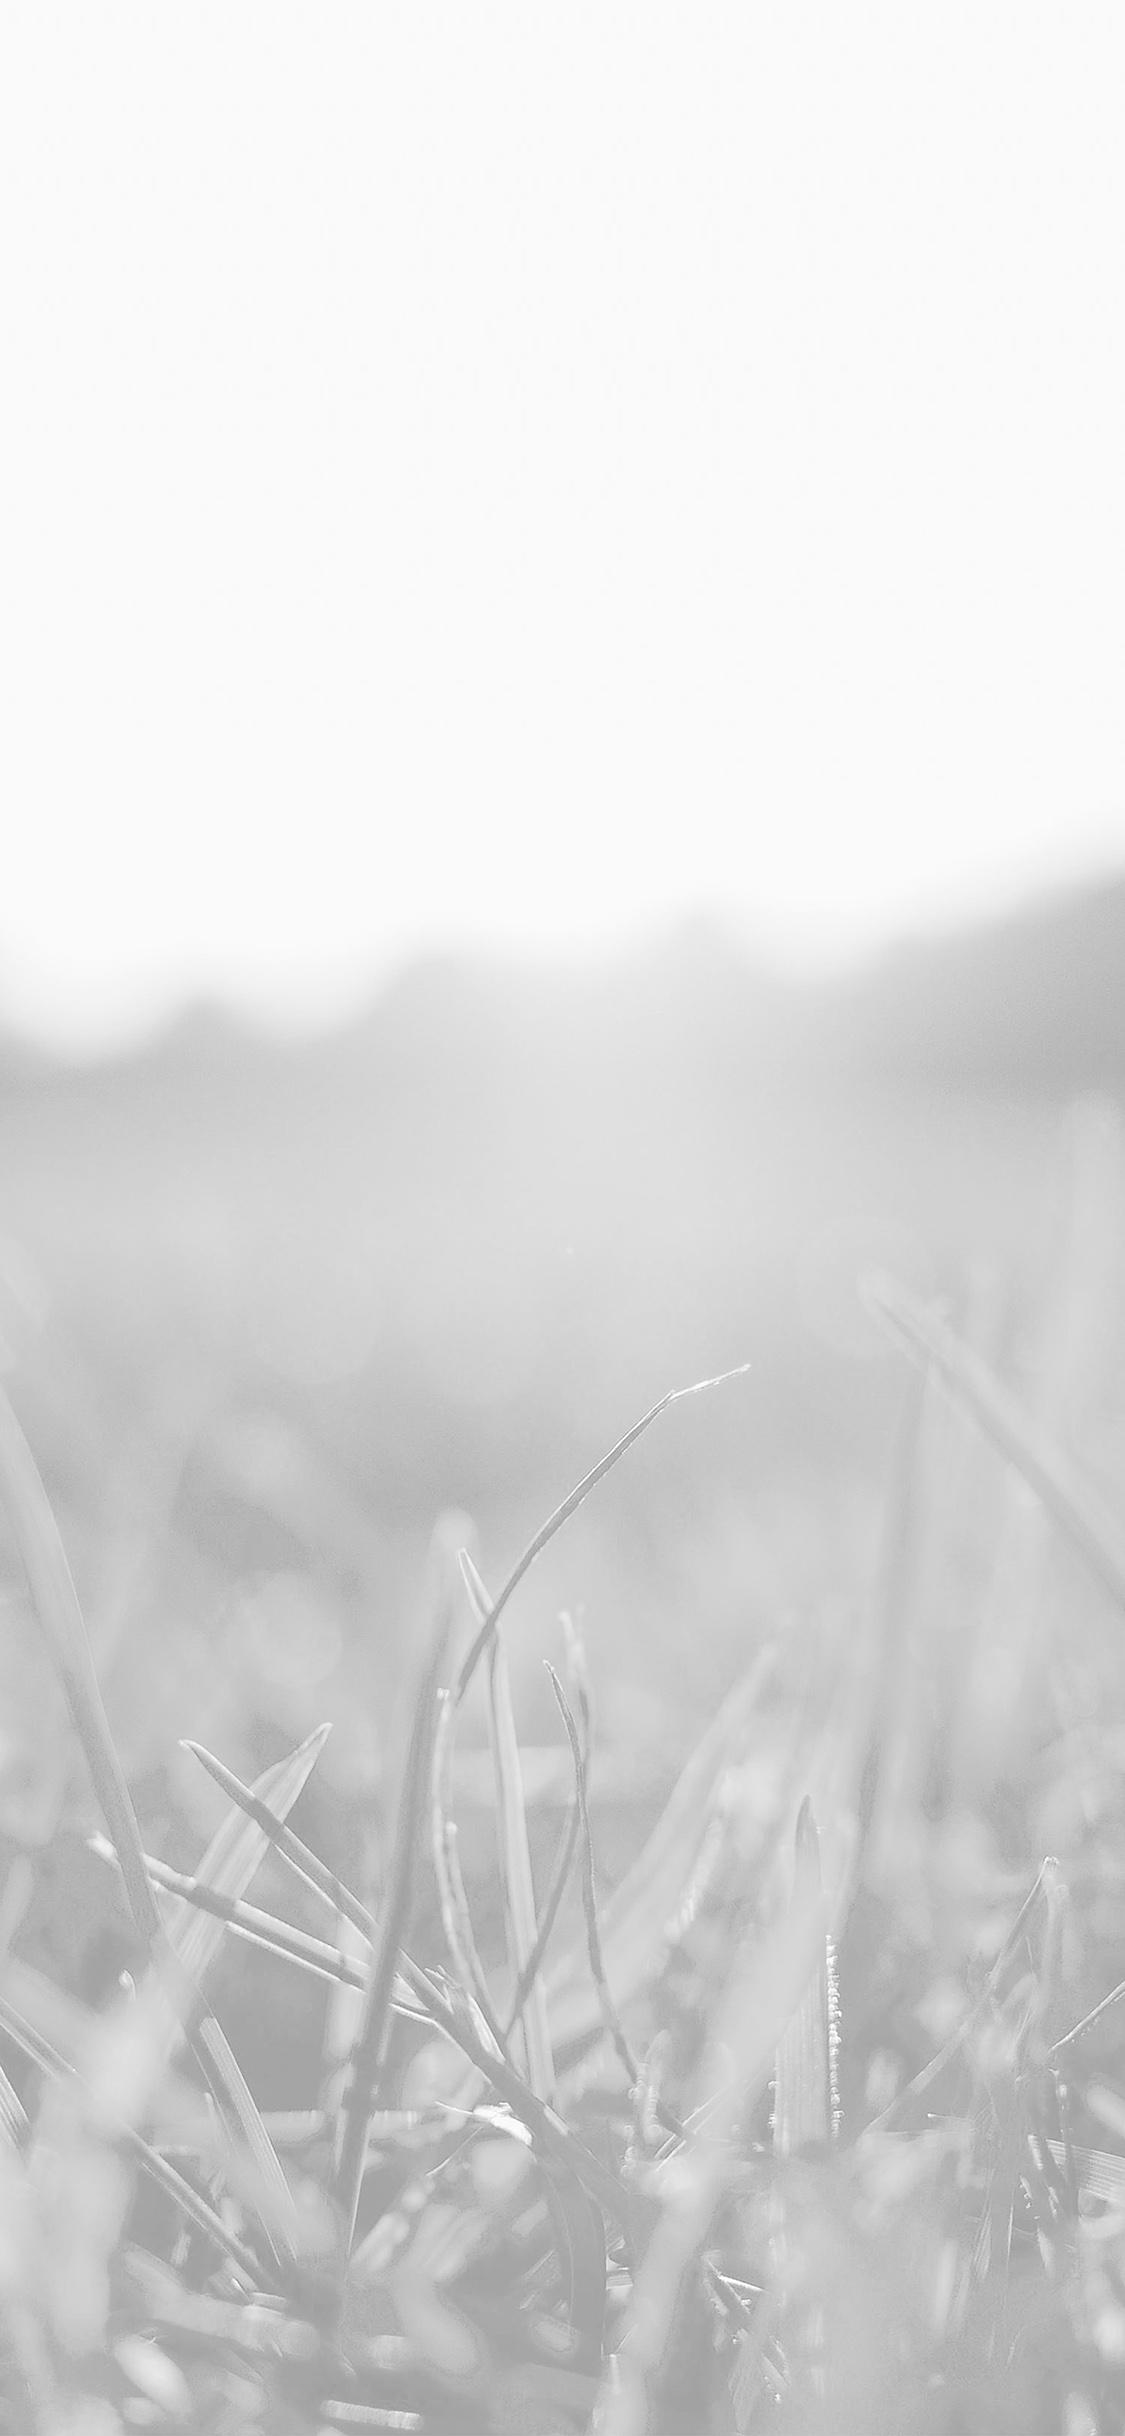 Iphonexpapers Com Iphone X Wallpaper Mw49 Grass White Bokeh Light Summer Nature